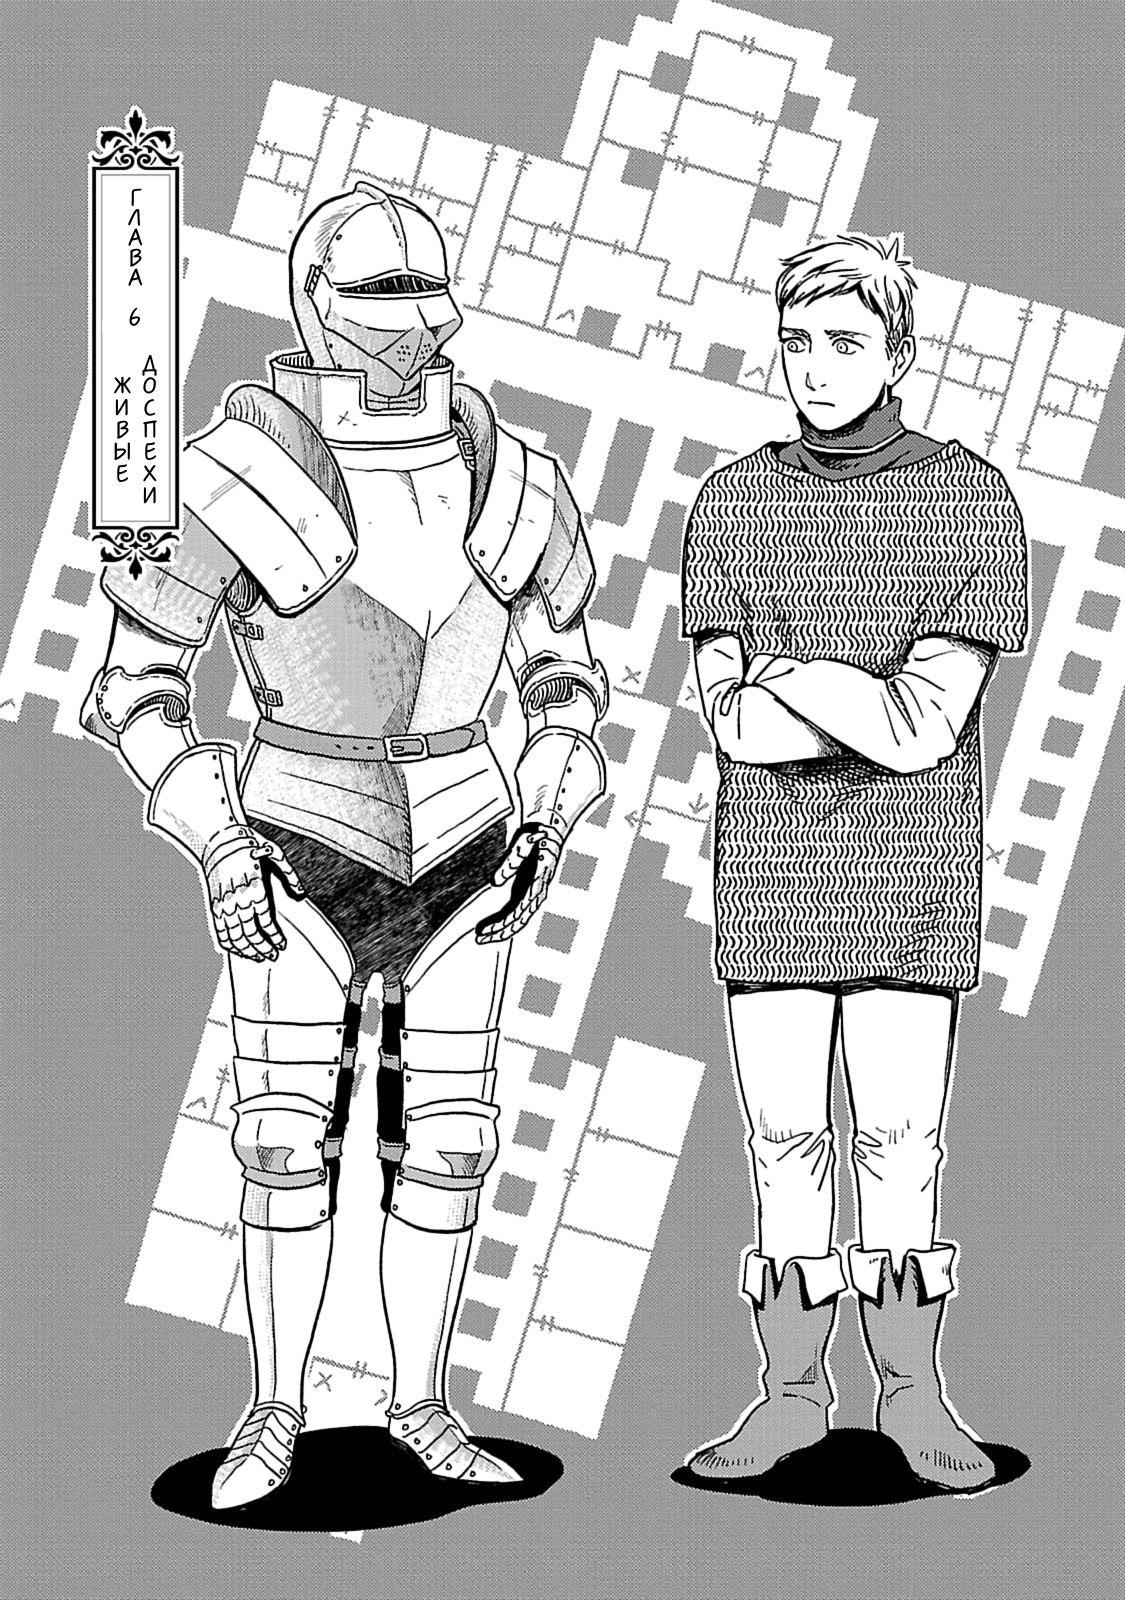 https://r1.ninemanga.com/comics/pic2/50/27634/1256234/1541270889261.jpg Page 1